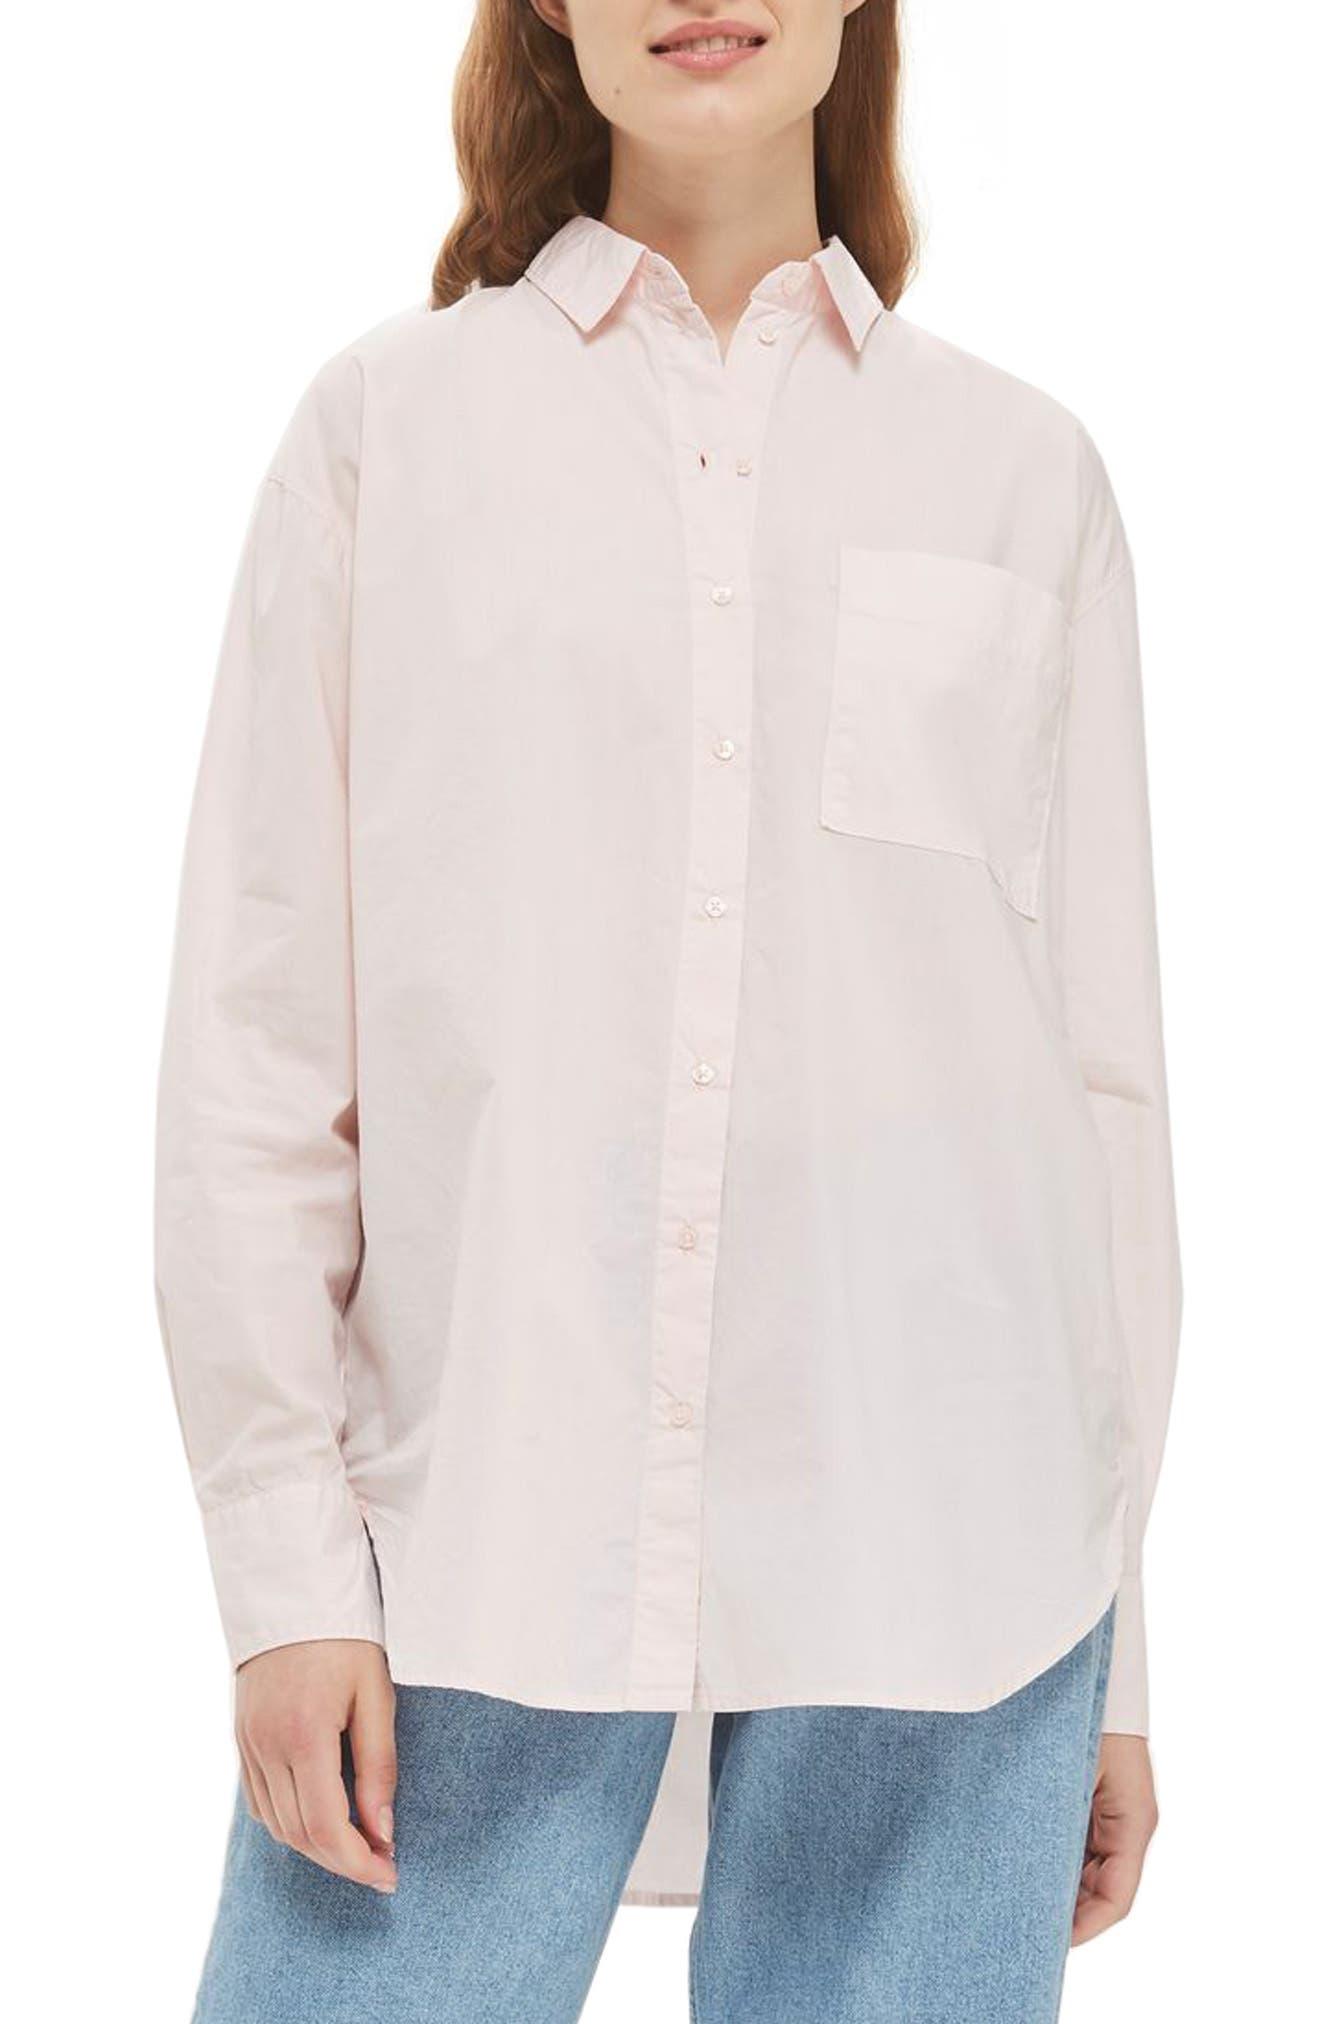 Olly Oversize Poplin Shirt,                             Main thumbnail 1, color,                             Light Pink